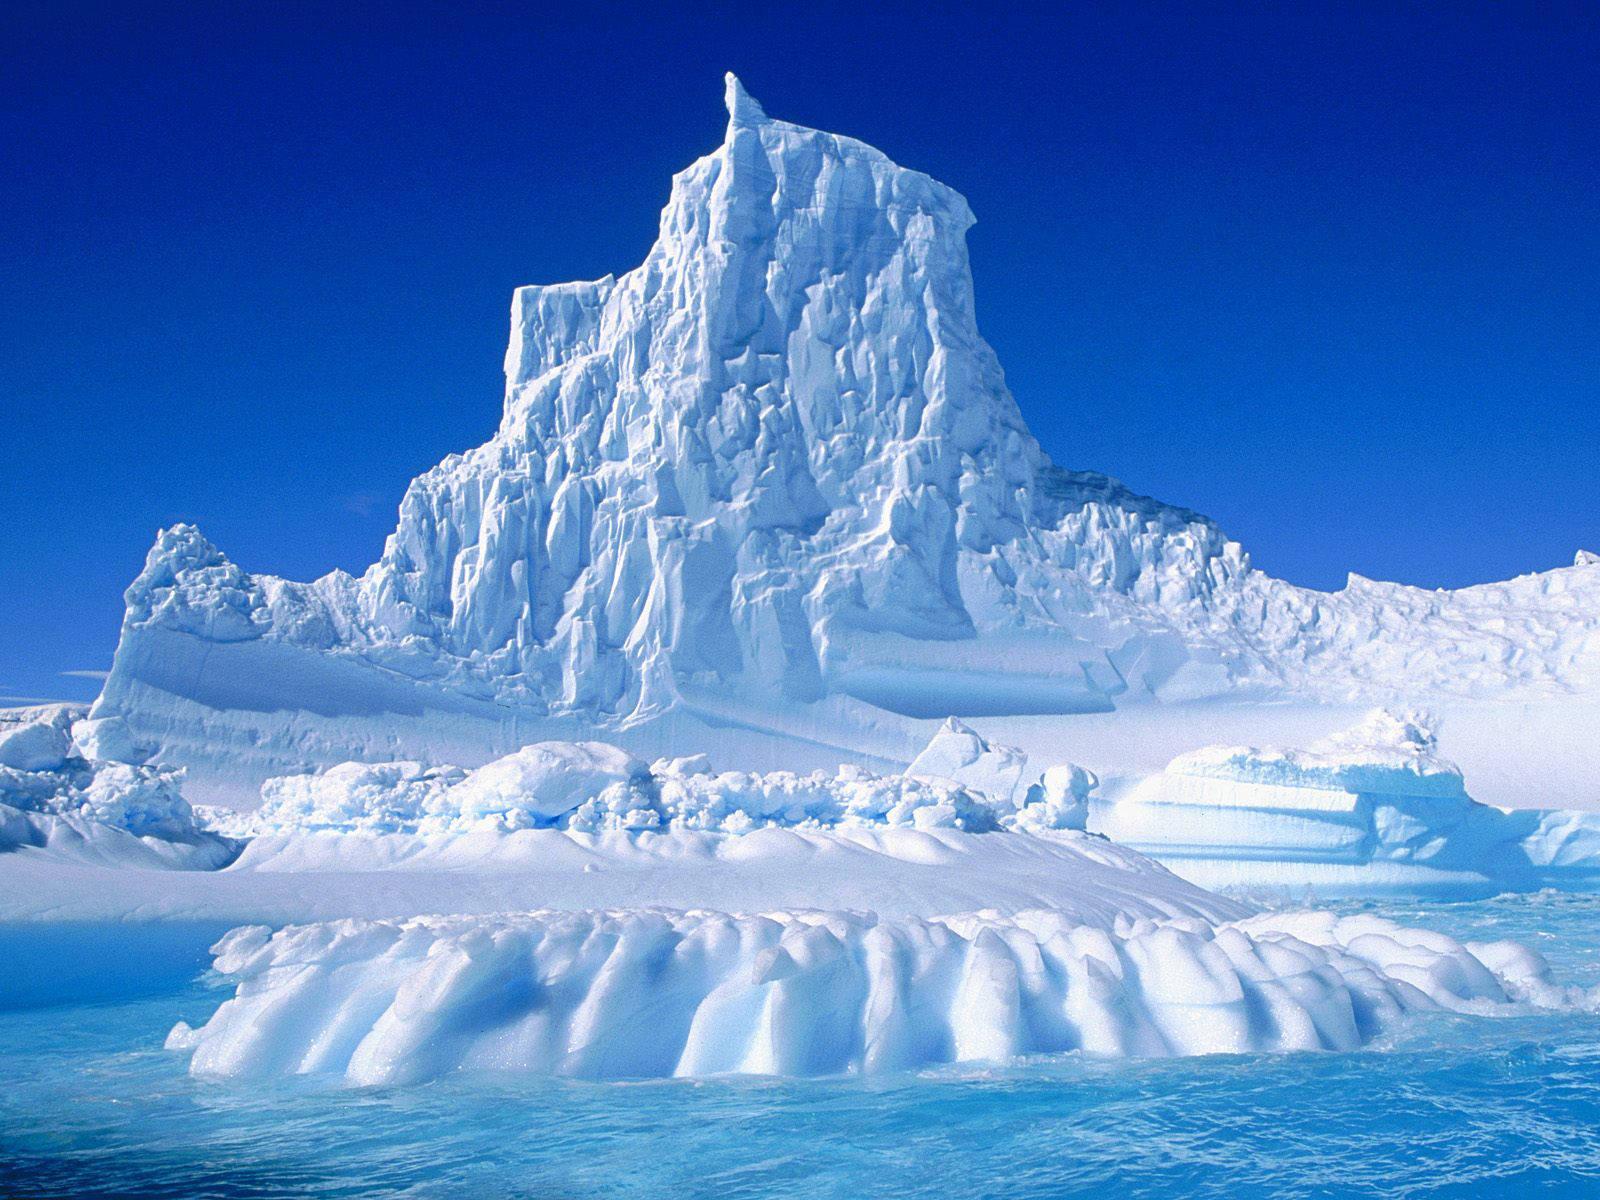 antarctica pictures A5